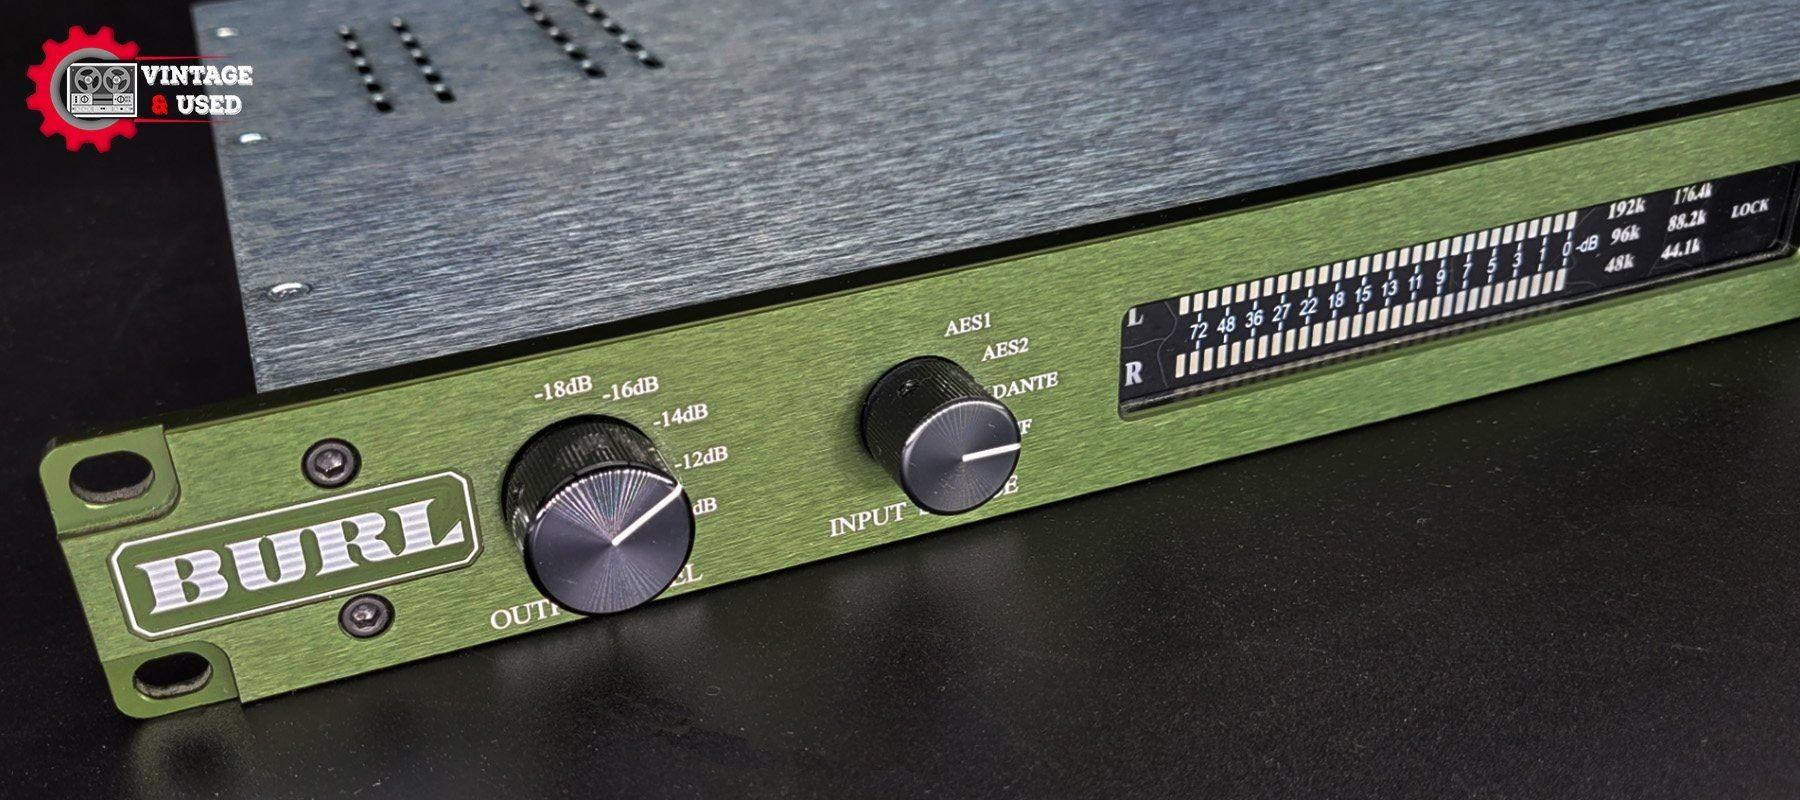 Burl Audio B2 Bomber DAC - LHS